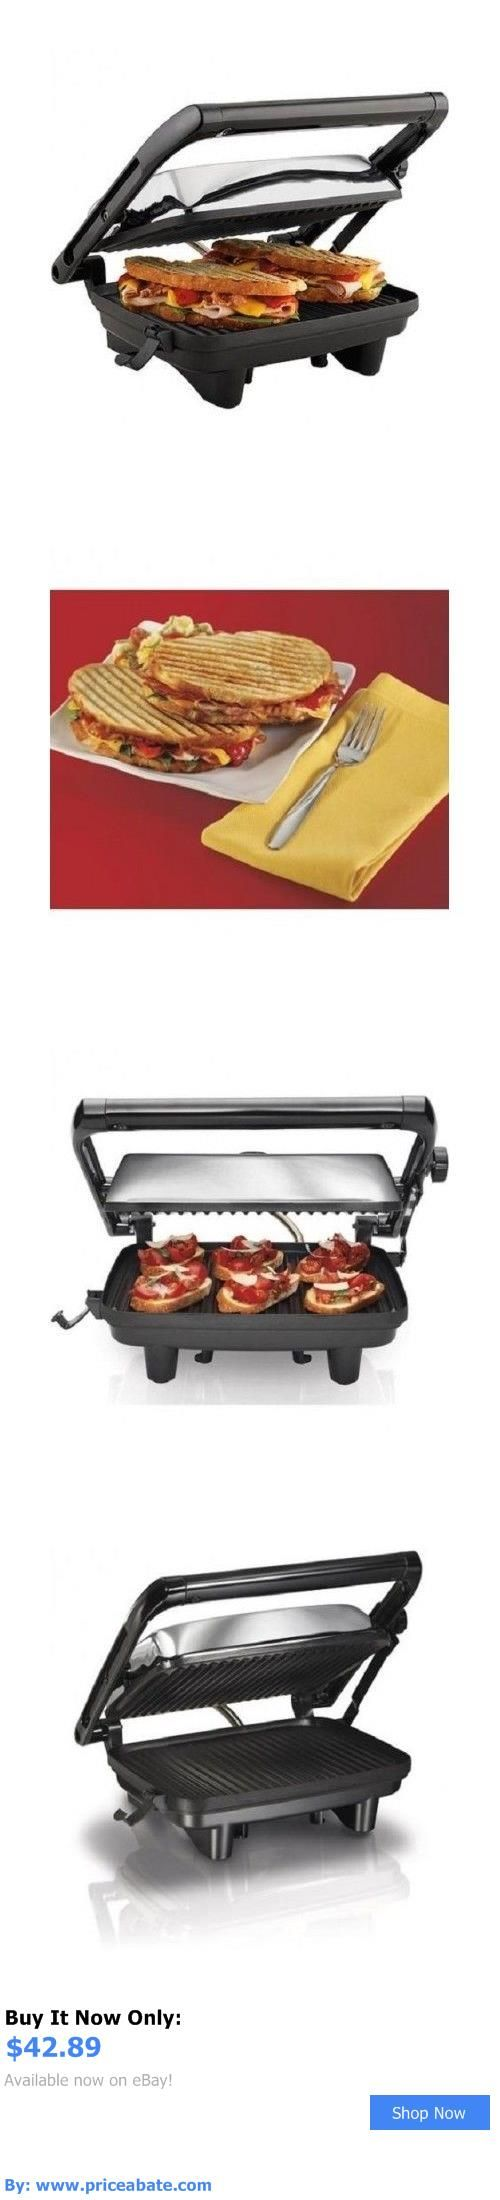 Small Kitchen Appliances: Panini Maker Gourmet Sandwich Press Hamilton Beach Kitchen Breakfast Toaster New BUY IT NOW ONLY: $42.89 #priceabateSmallKitchenAppliances OR #priceabate